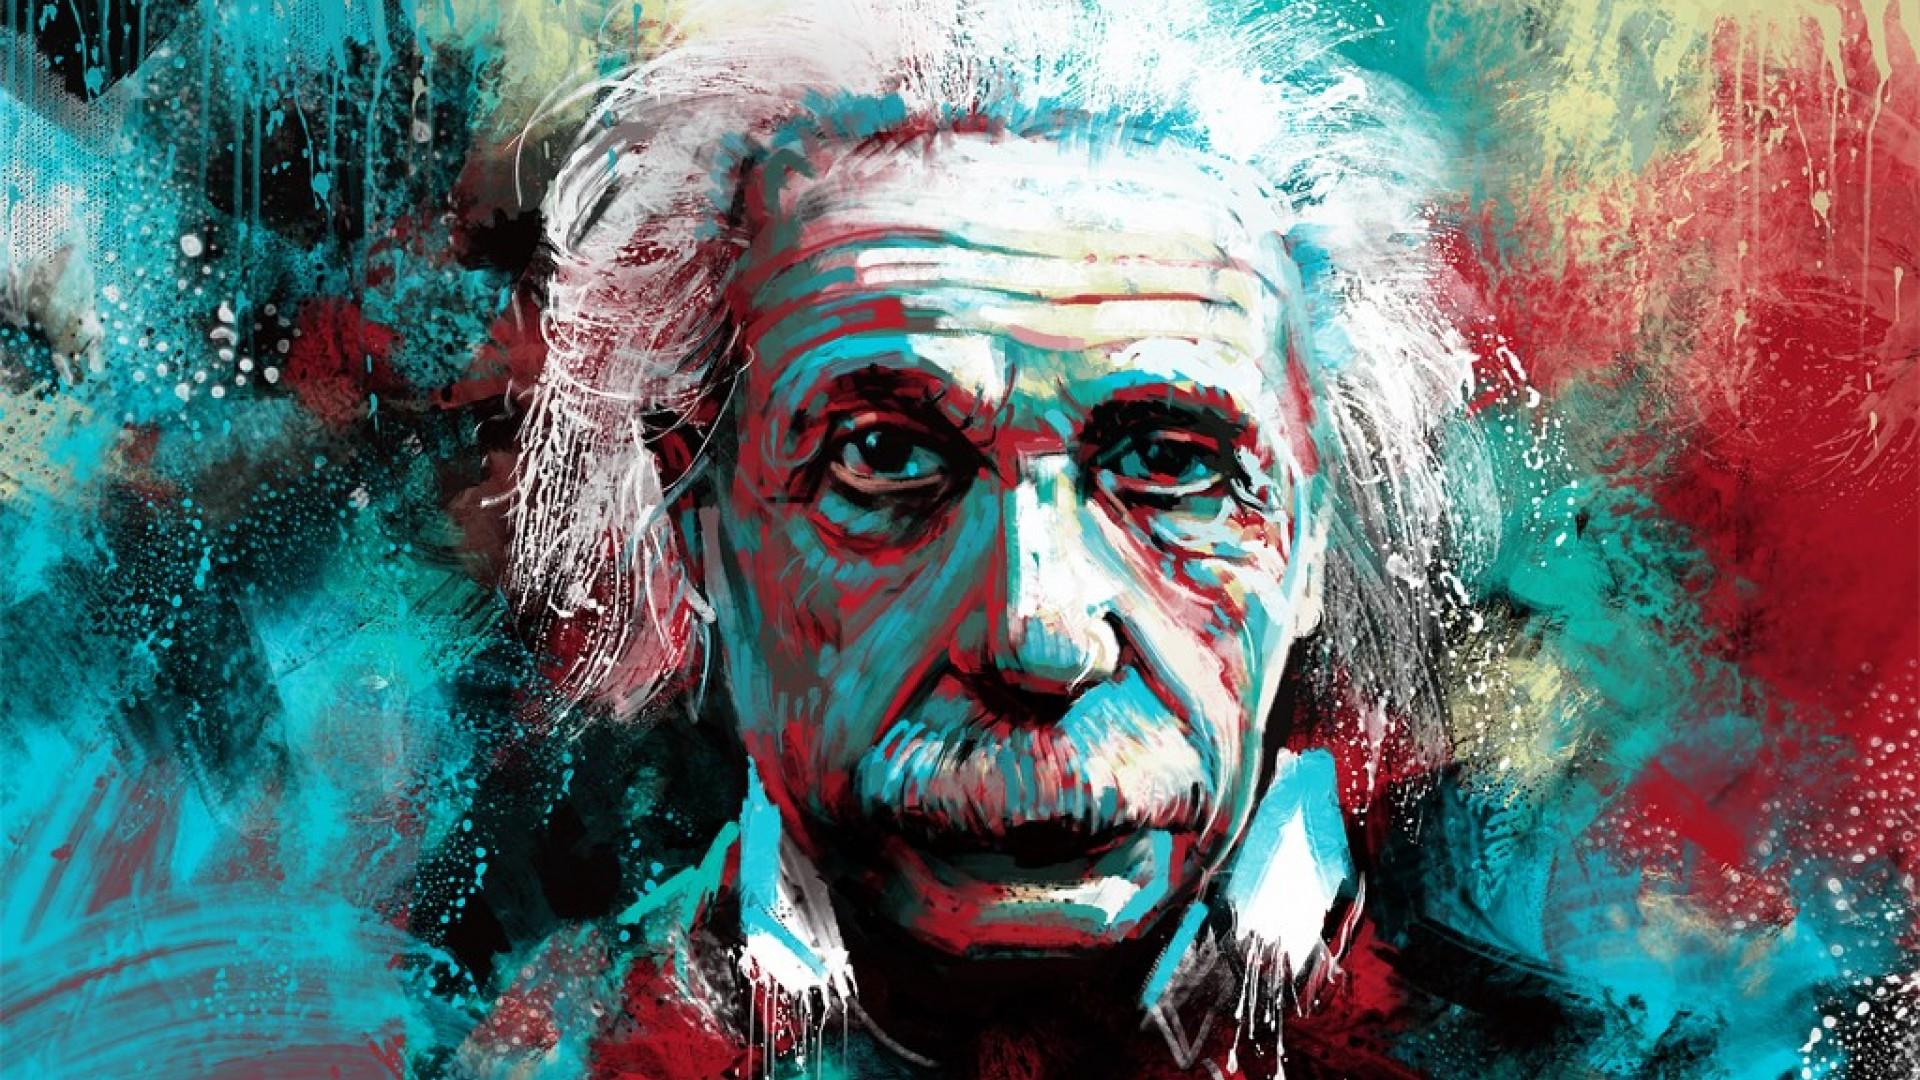 Albert Einstein Wallpapers HD - WallpaperSafari